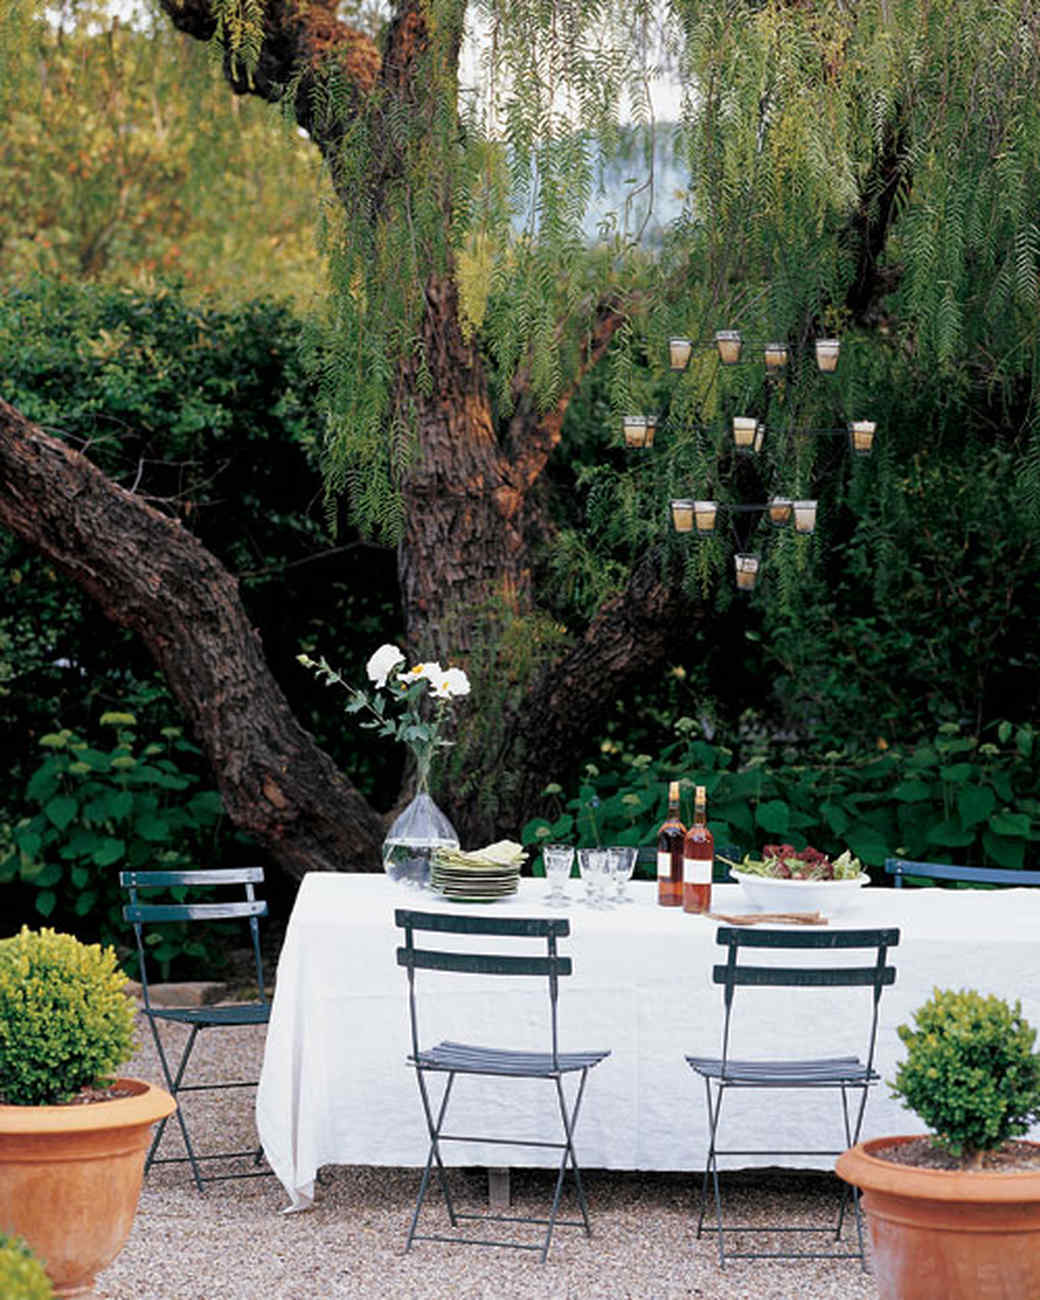 mla101559_sept2005_garden1.jpg